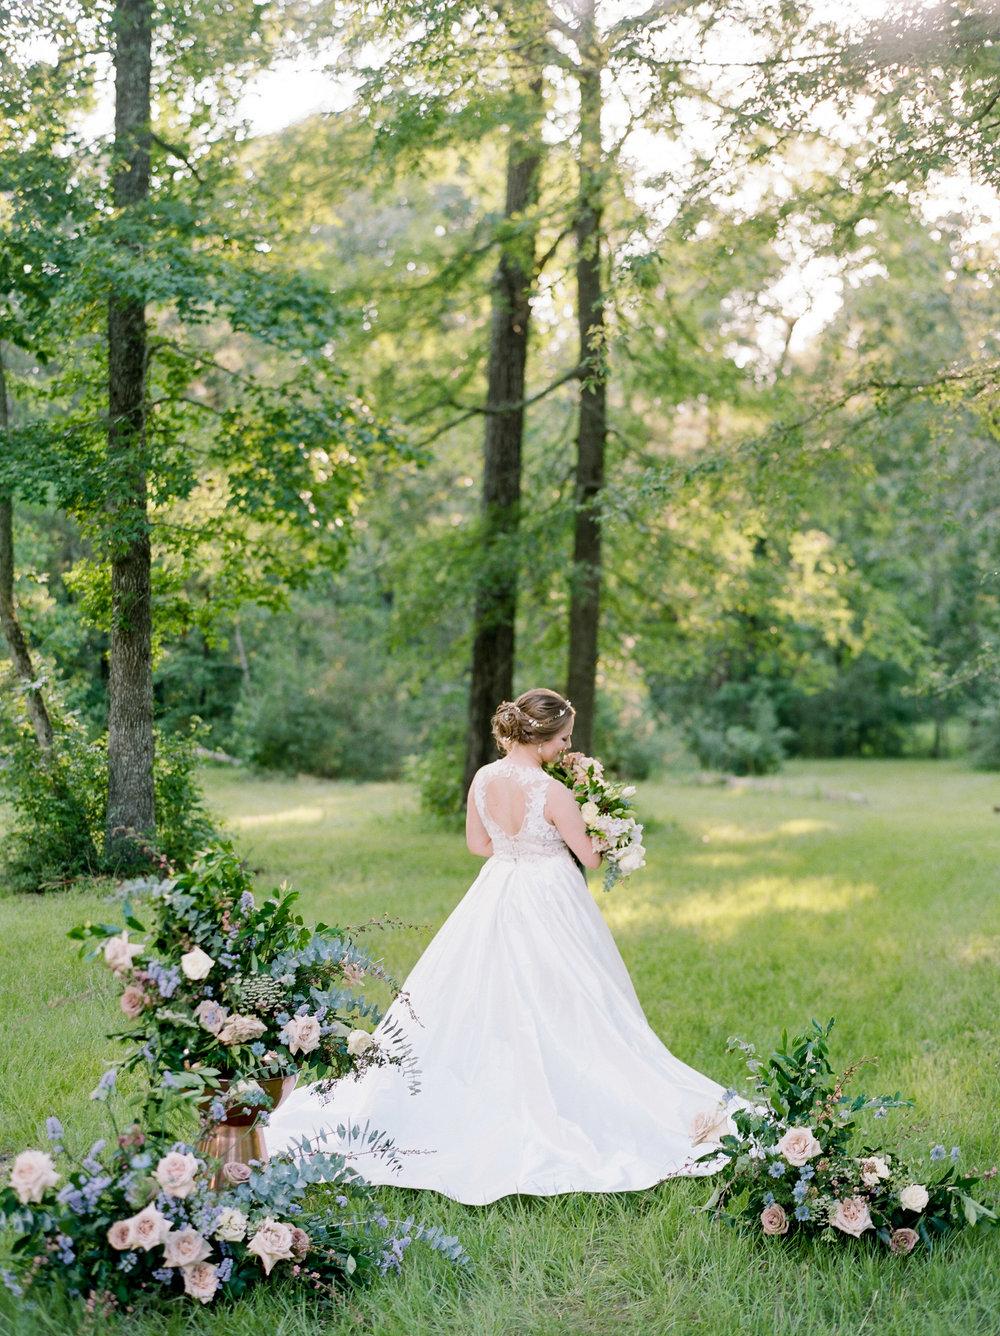 Houston-Fine-Art-Film-Destination-Wedding-Photographer-Top-Best-Luxury-Josh-Dana-Fernandez-Photographer-Austin-Texas-14.jpg